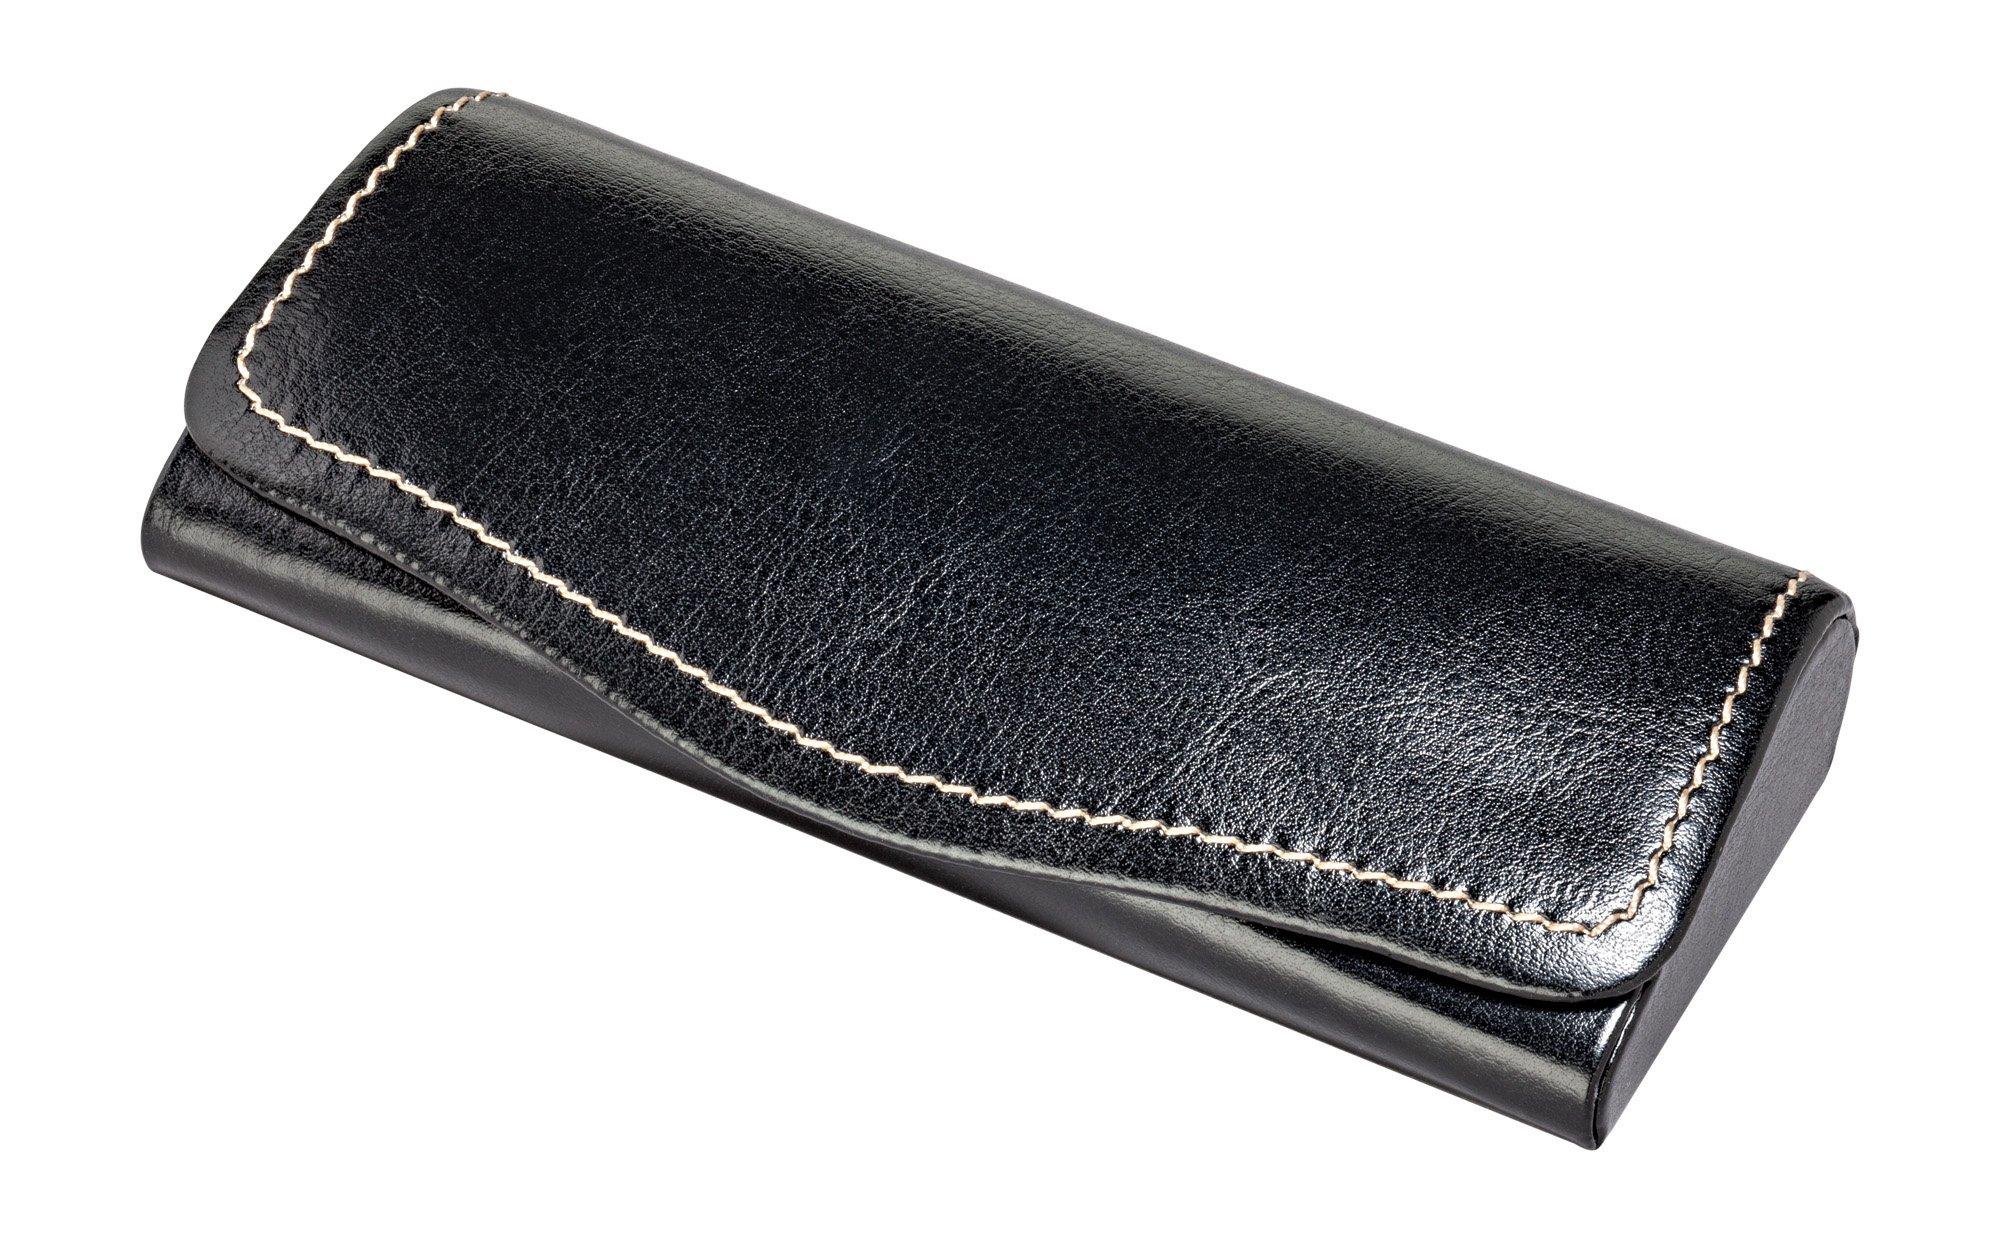 Glasses Case For Men & Women, Hard Eyeglass Case W/Magnetic Closure In Faux Leather, Black